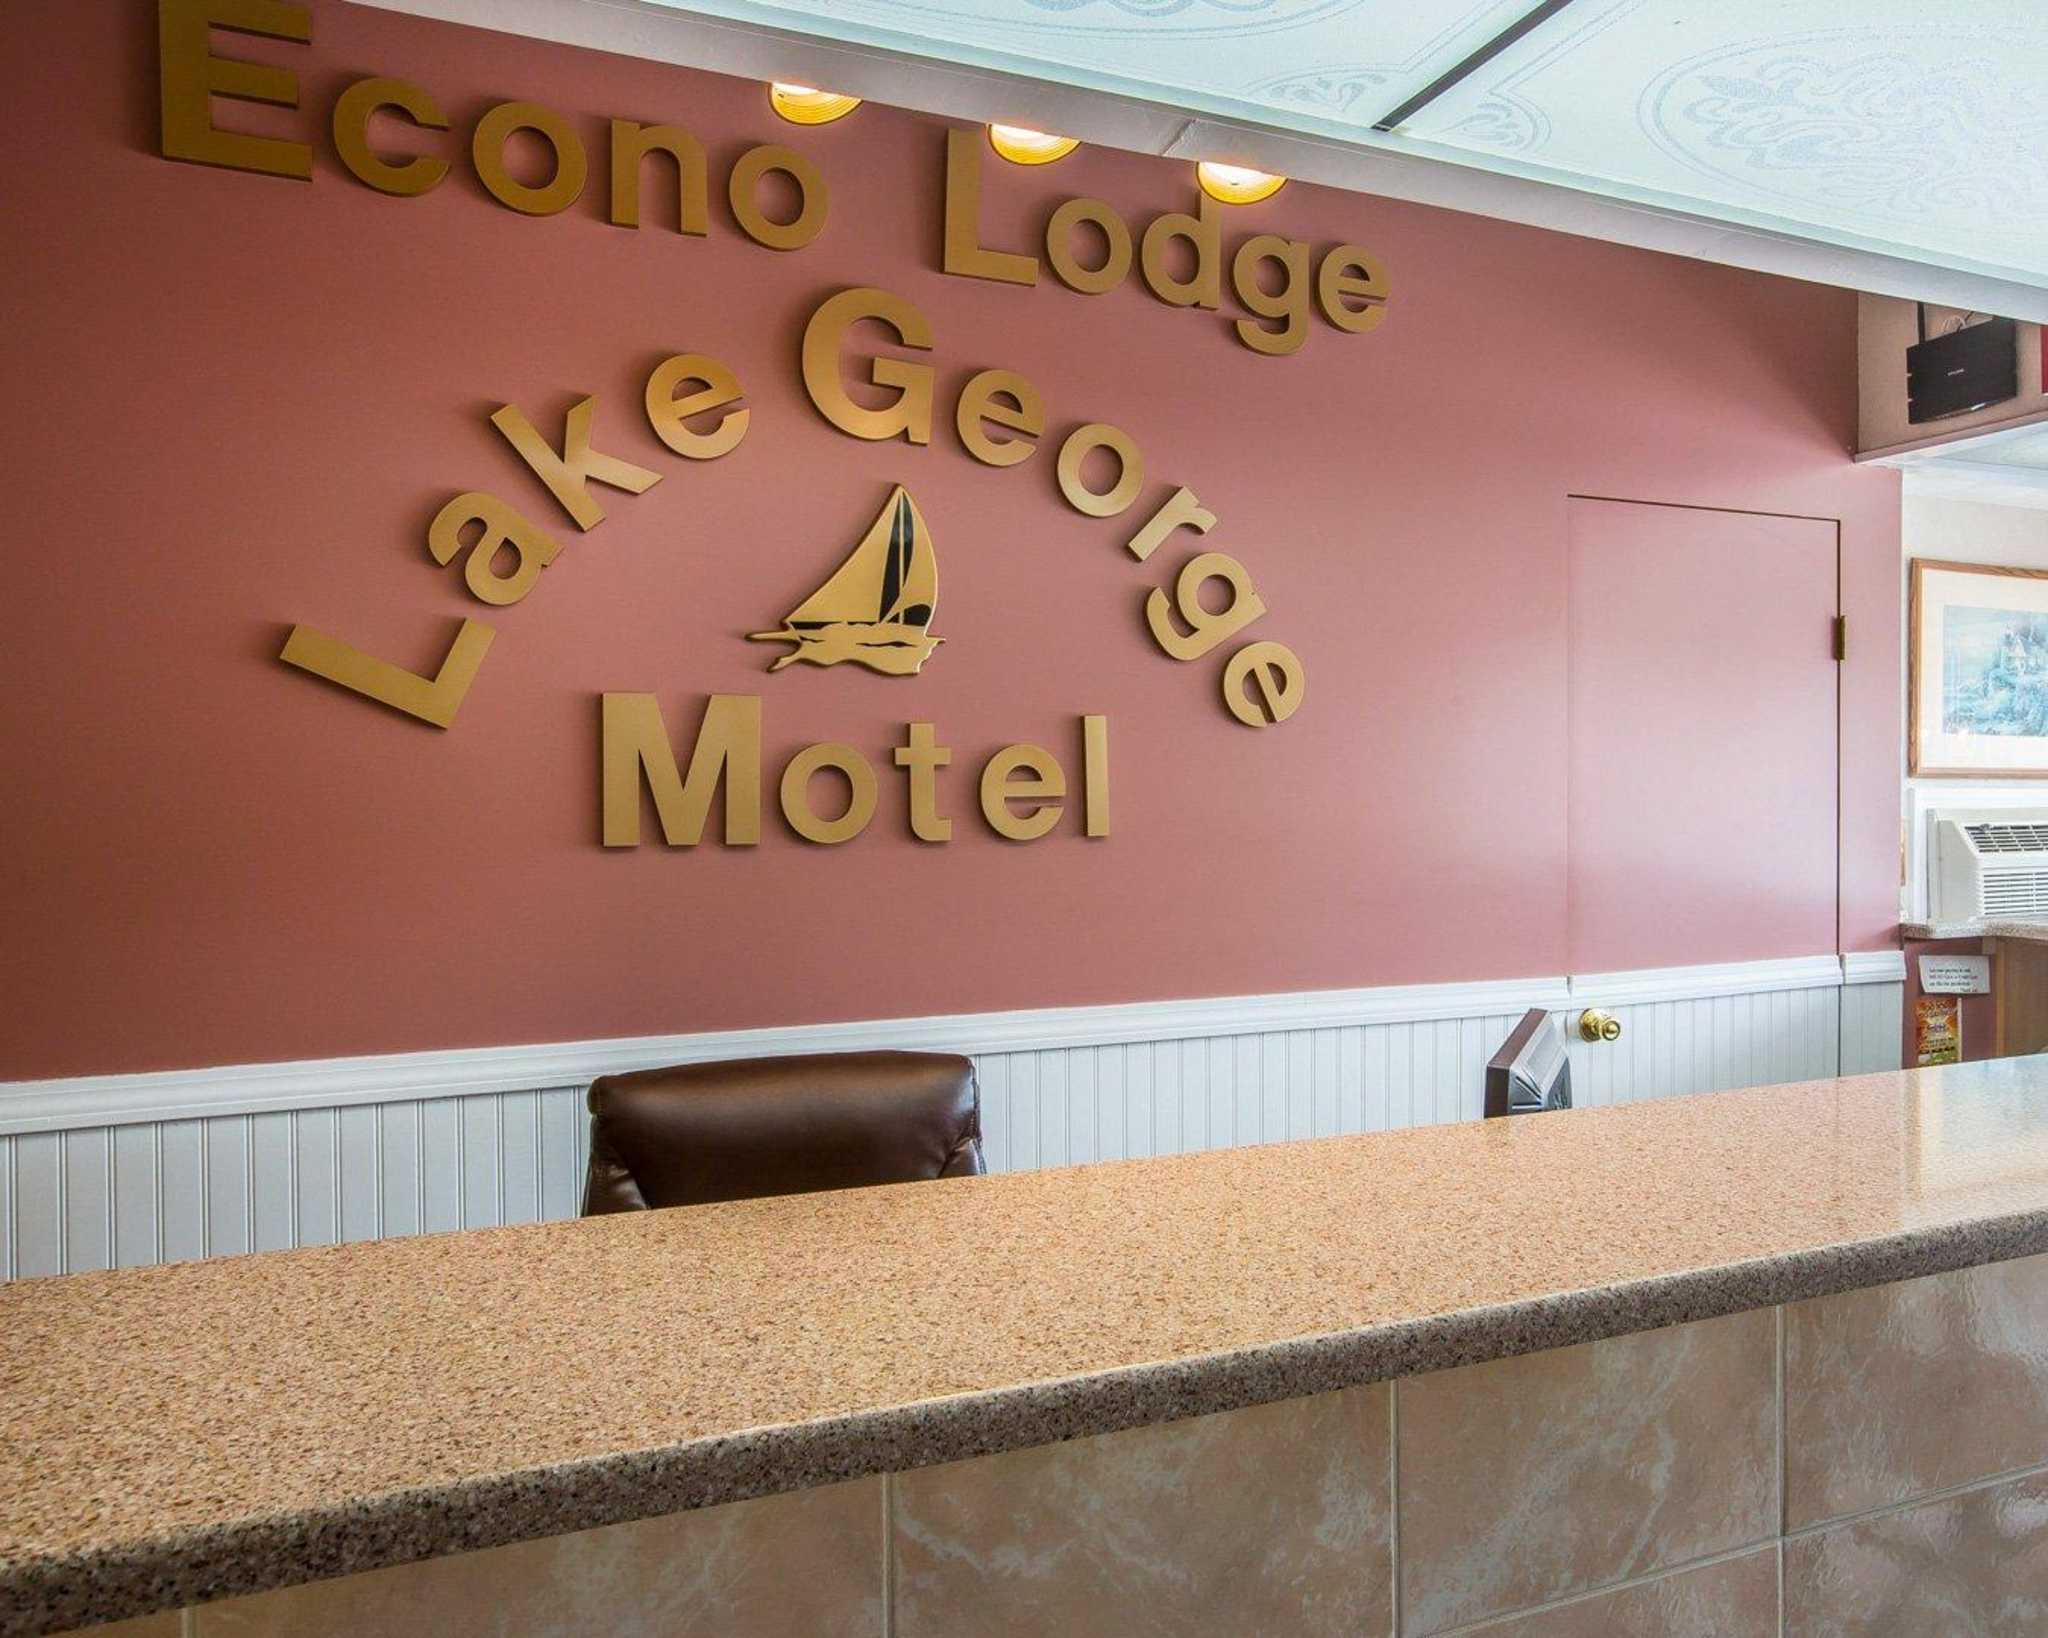 Econo Lodge at Lake George, Downtown image 20